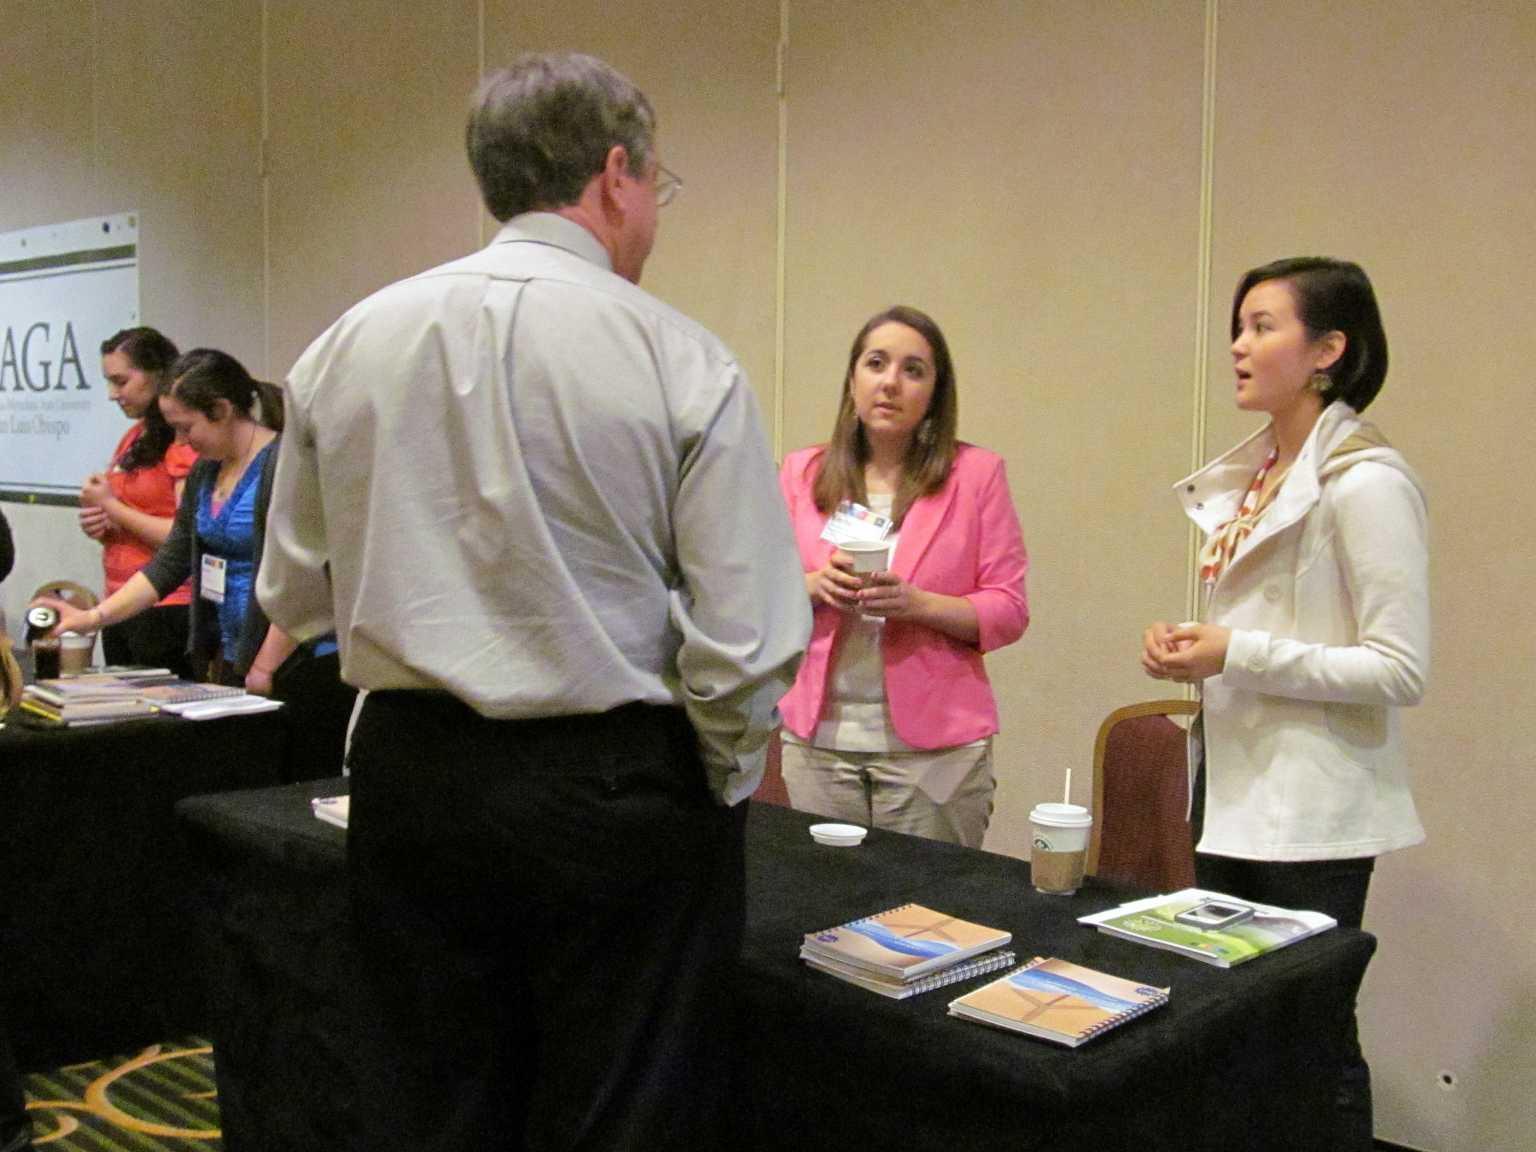 Journal presentation at TAGA conference